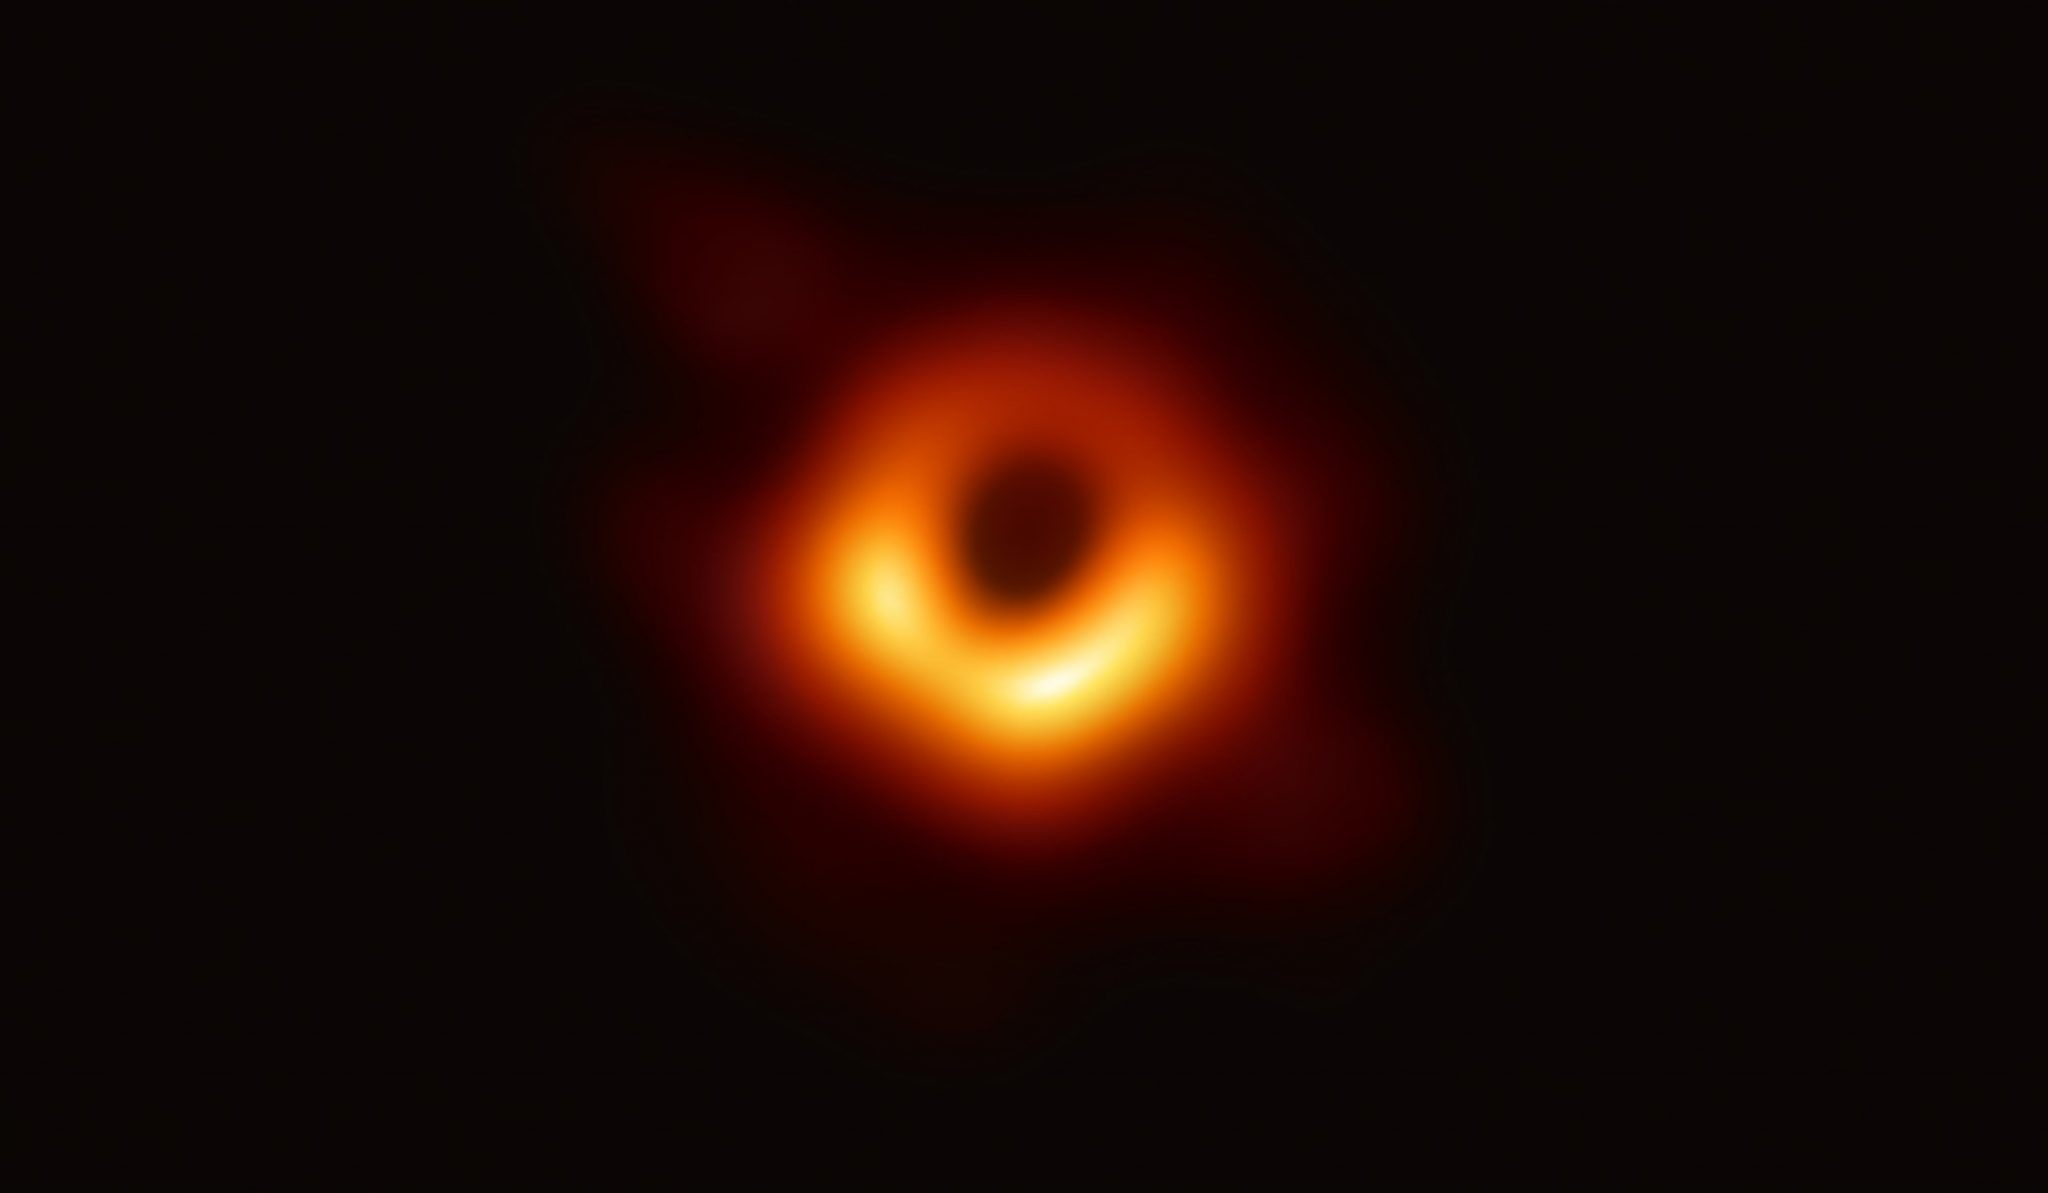 kara delik event horizon